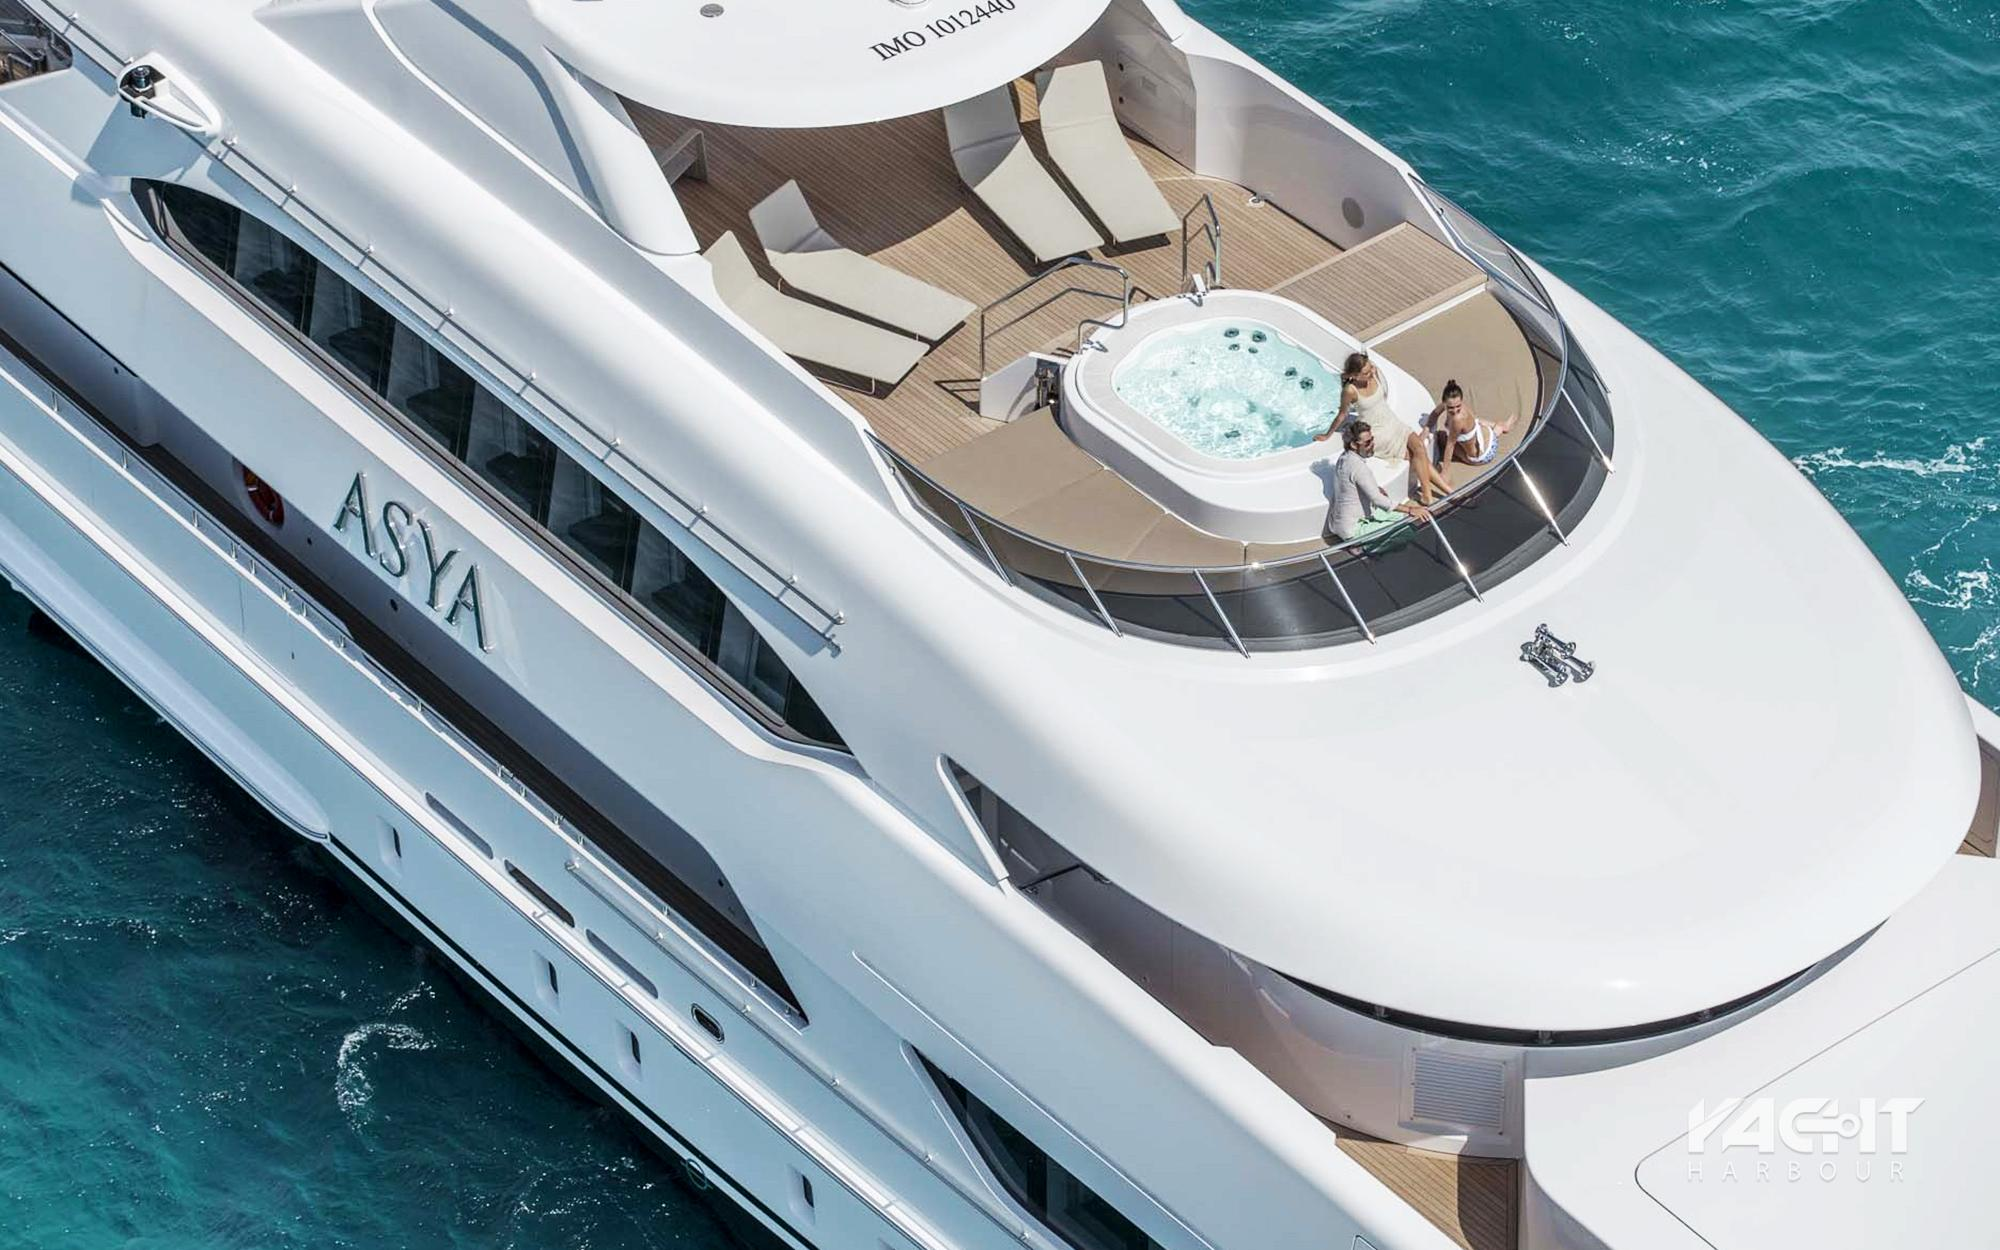 Asya upper deck